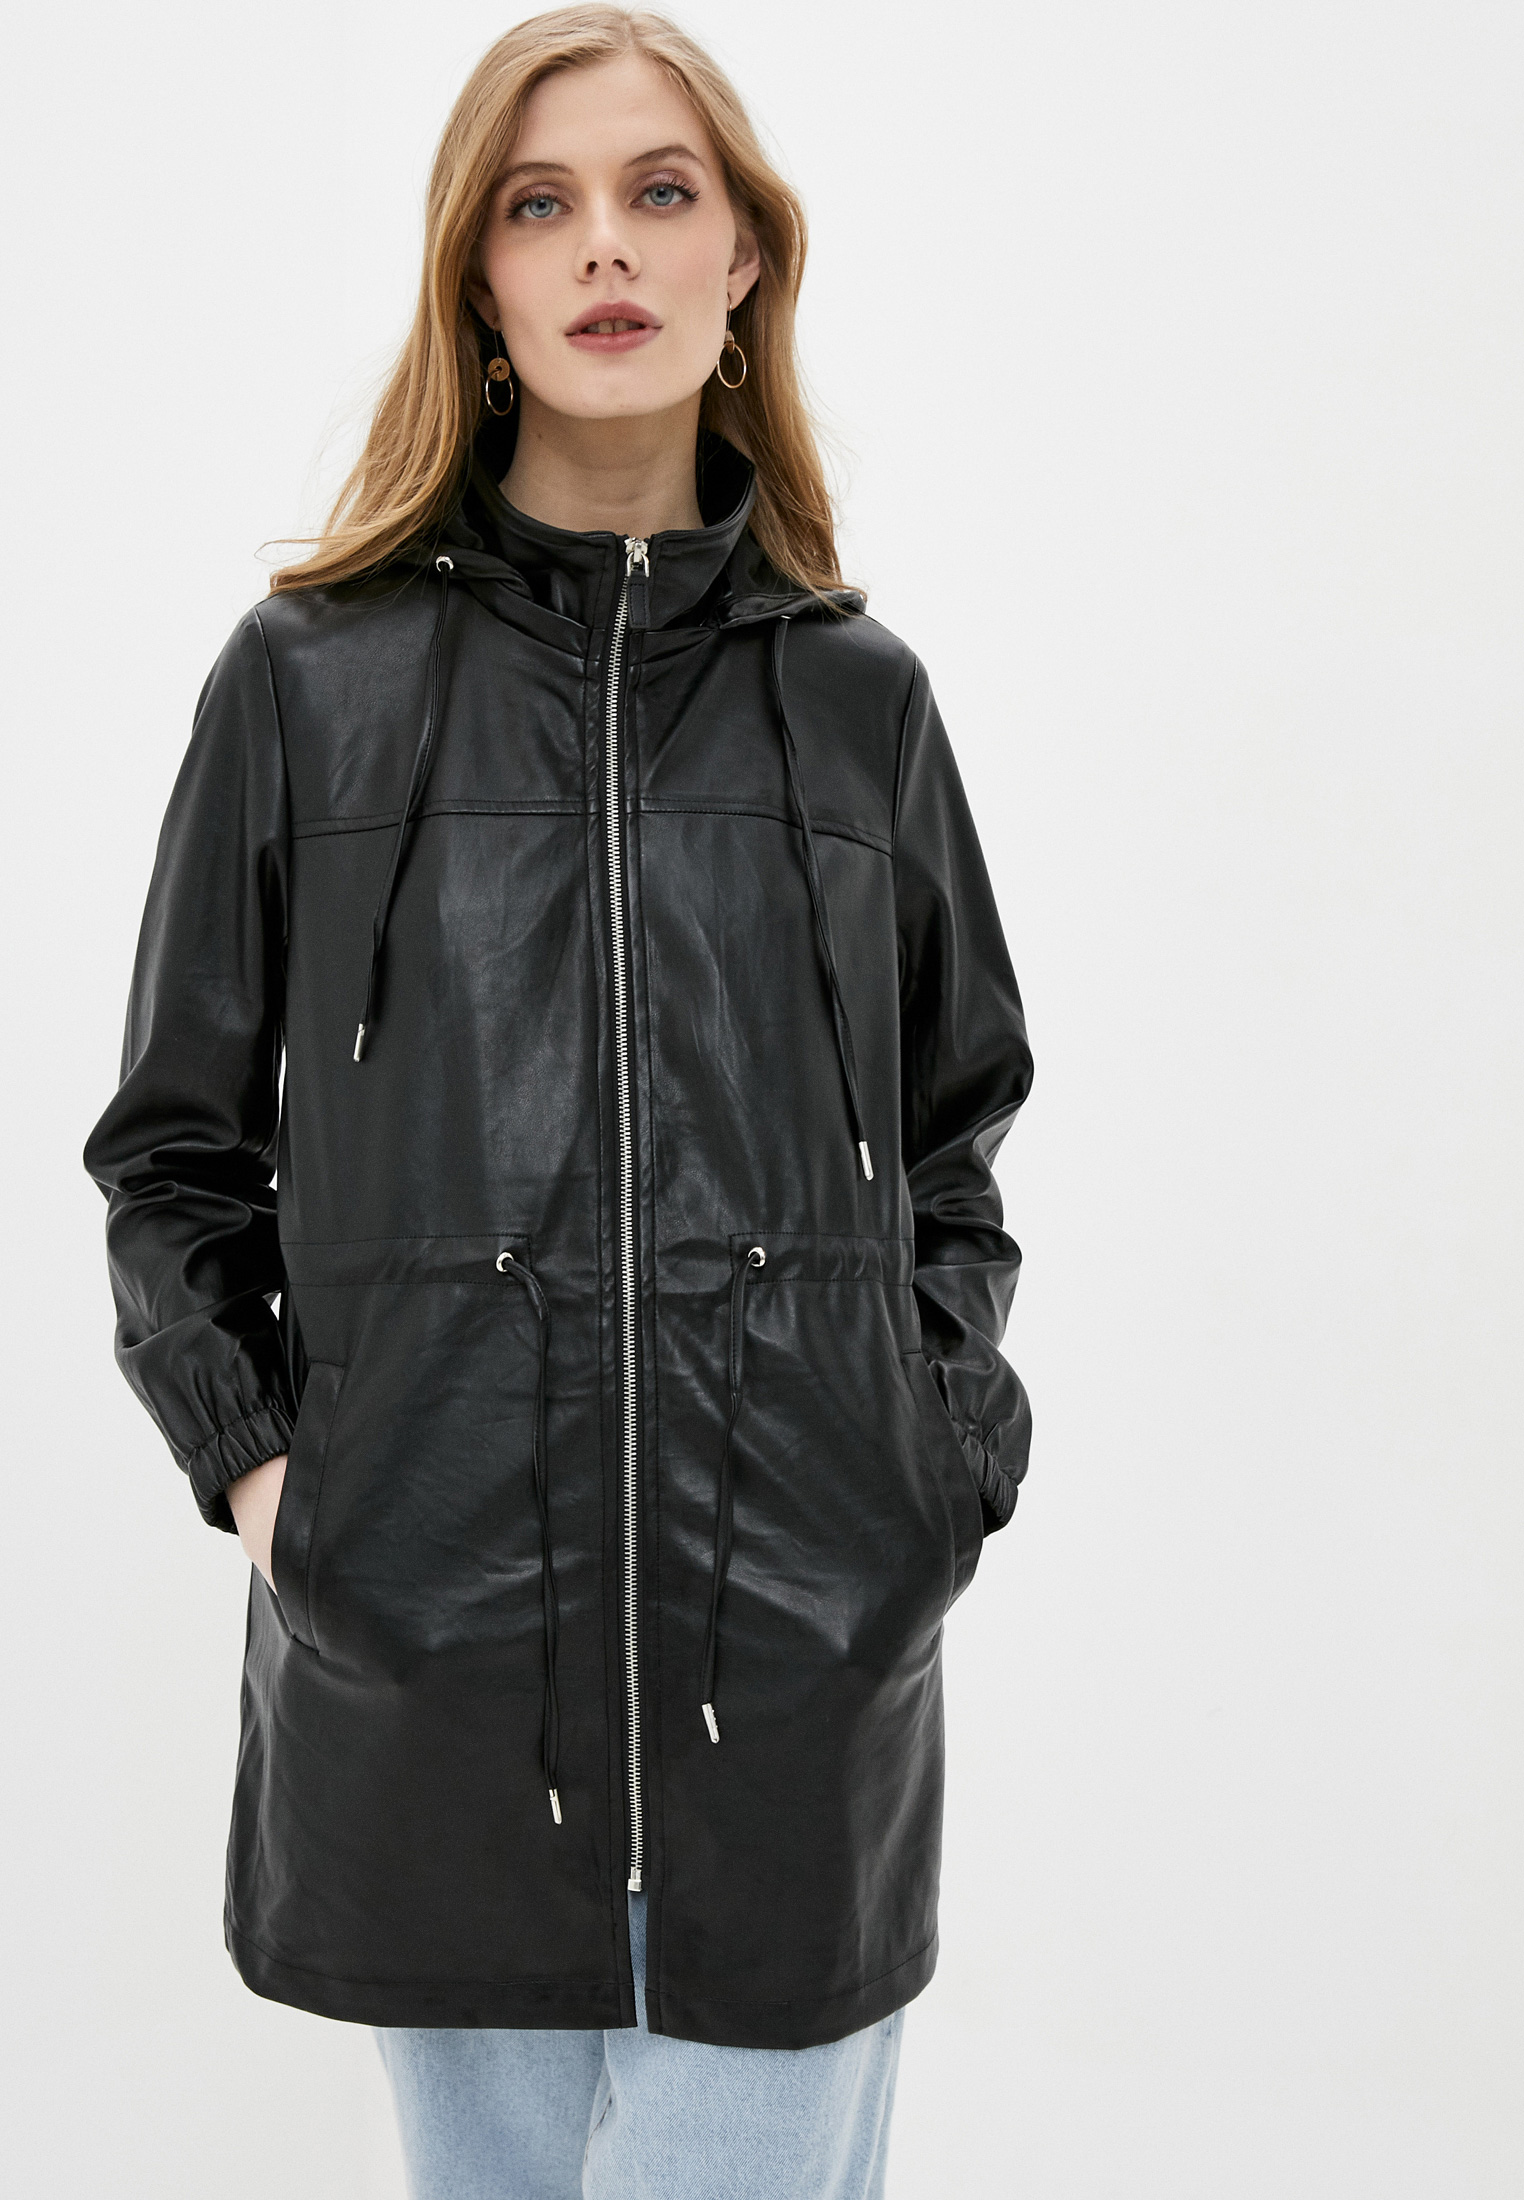 Кожаная куртка Softy S20505